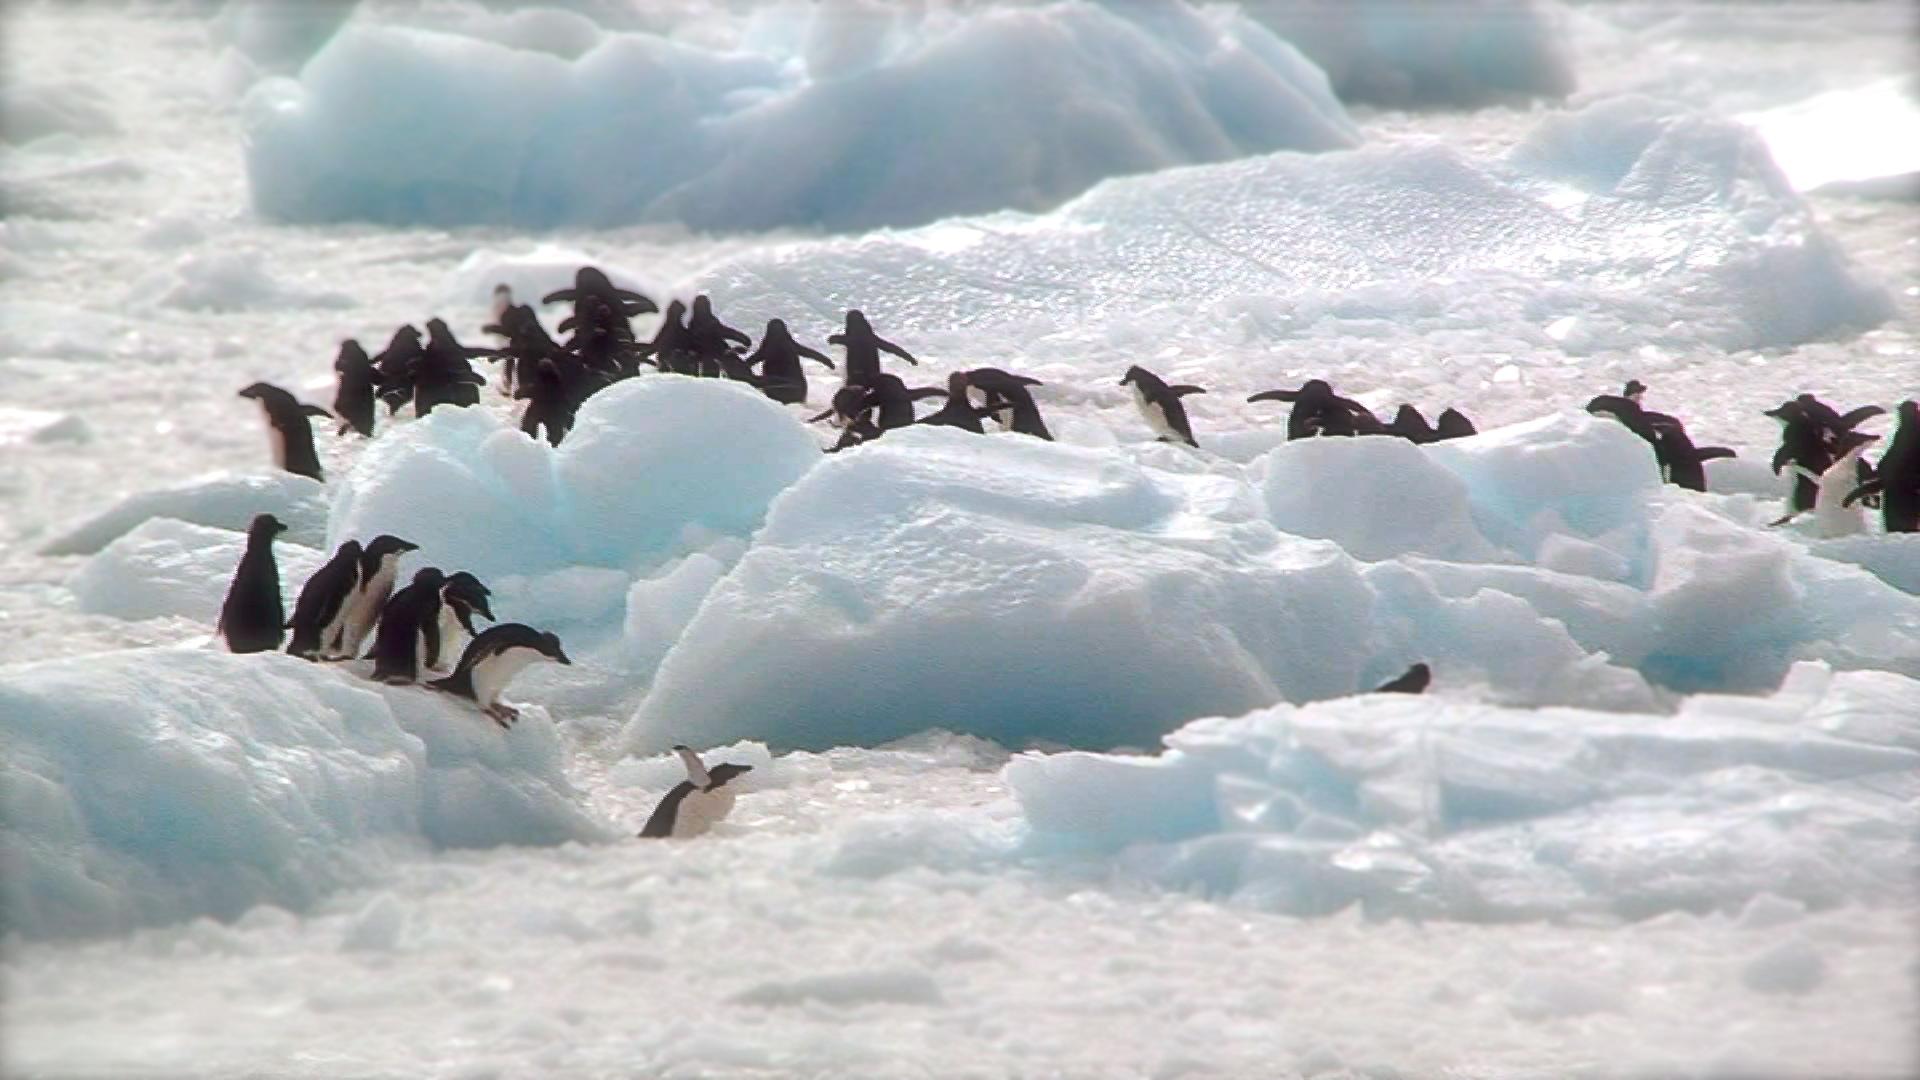 Ad%C3%A9lie_penguins_in_Antarctica,_Antarctic_Peninsula.JPEG